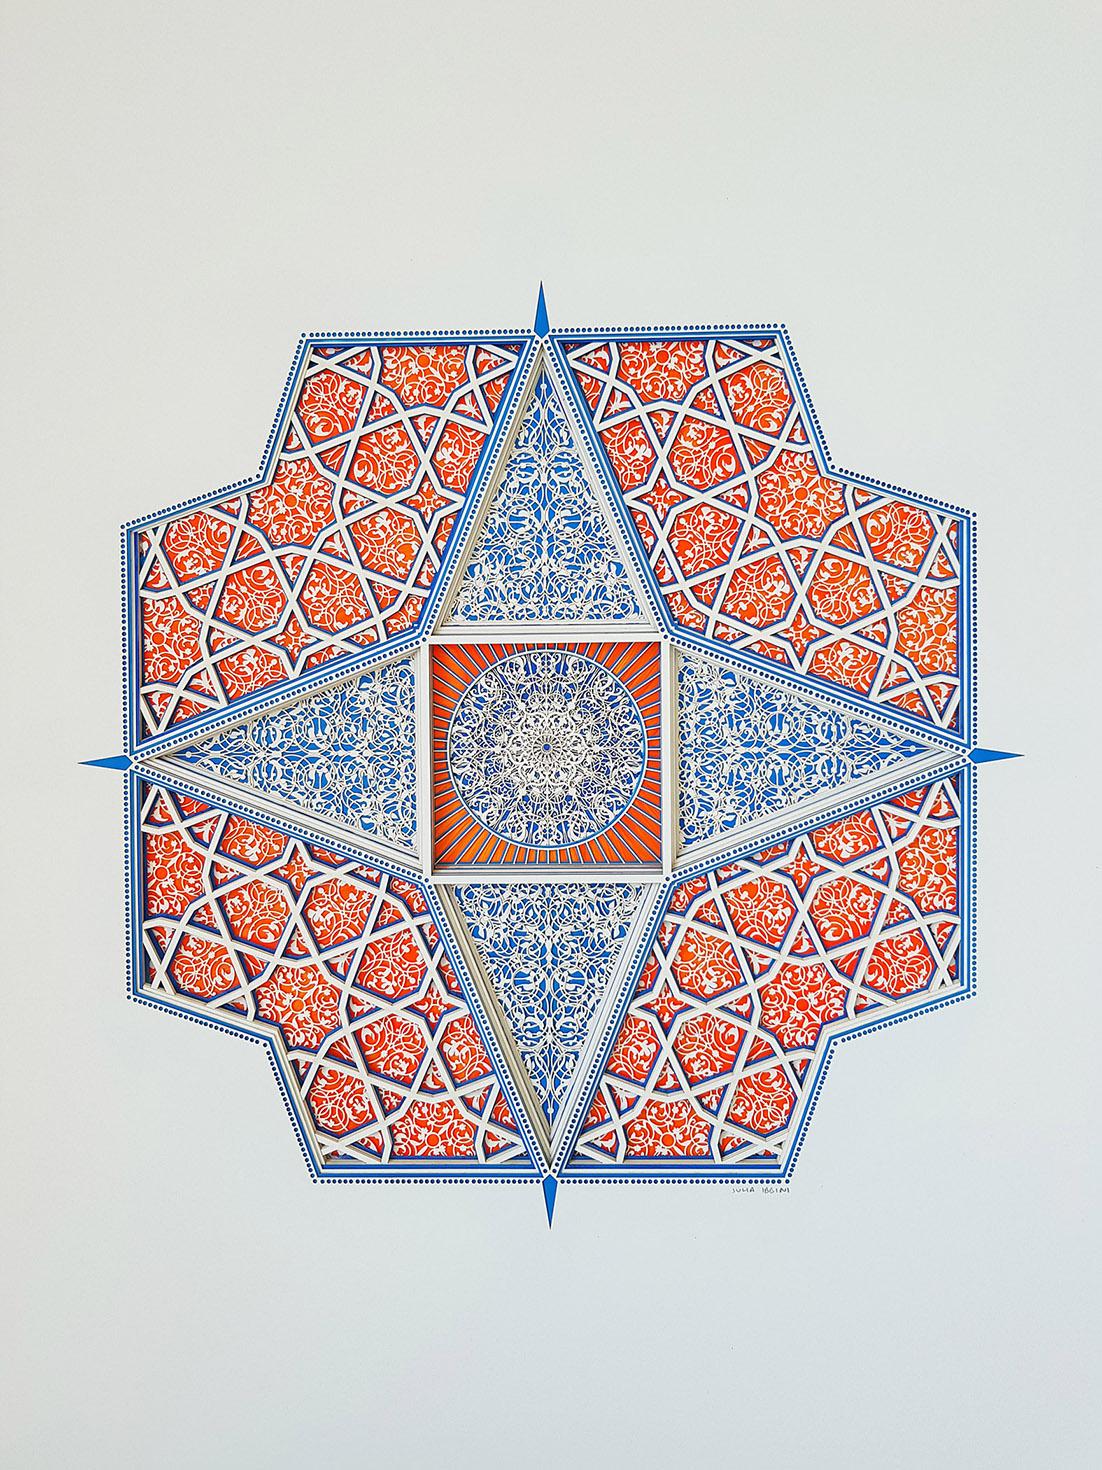 Juxtapoz-Clunhouse-5-Julia-Ibbini-Untitled-Study-Touba